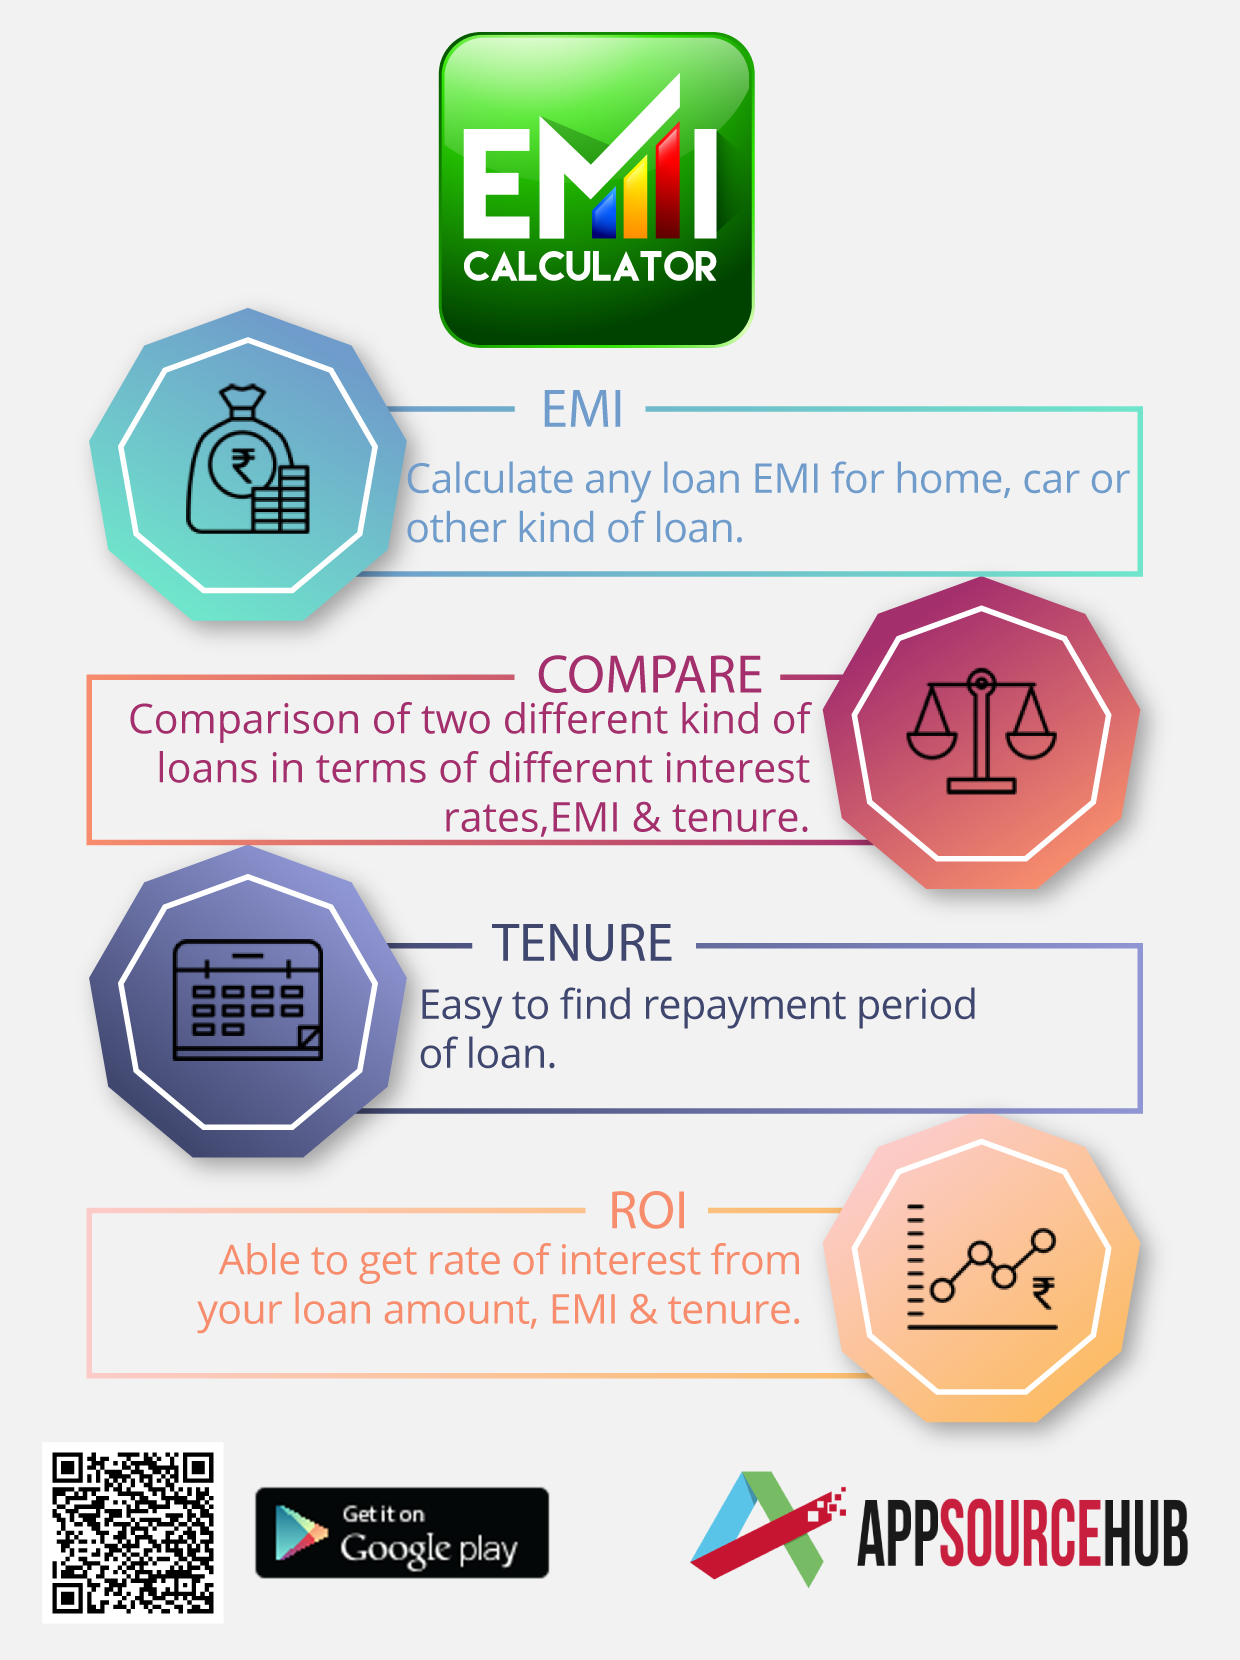 Car Loan Calculator App >> Calculate Your Emi By Using Our Car Loan Calculator App